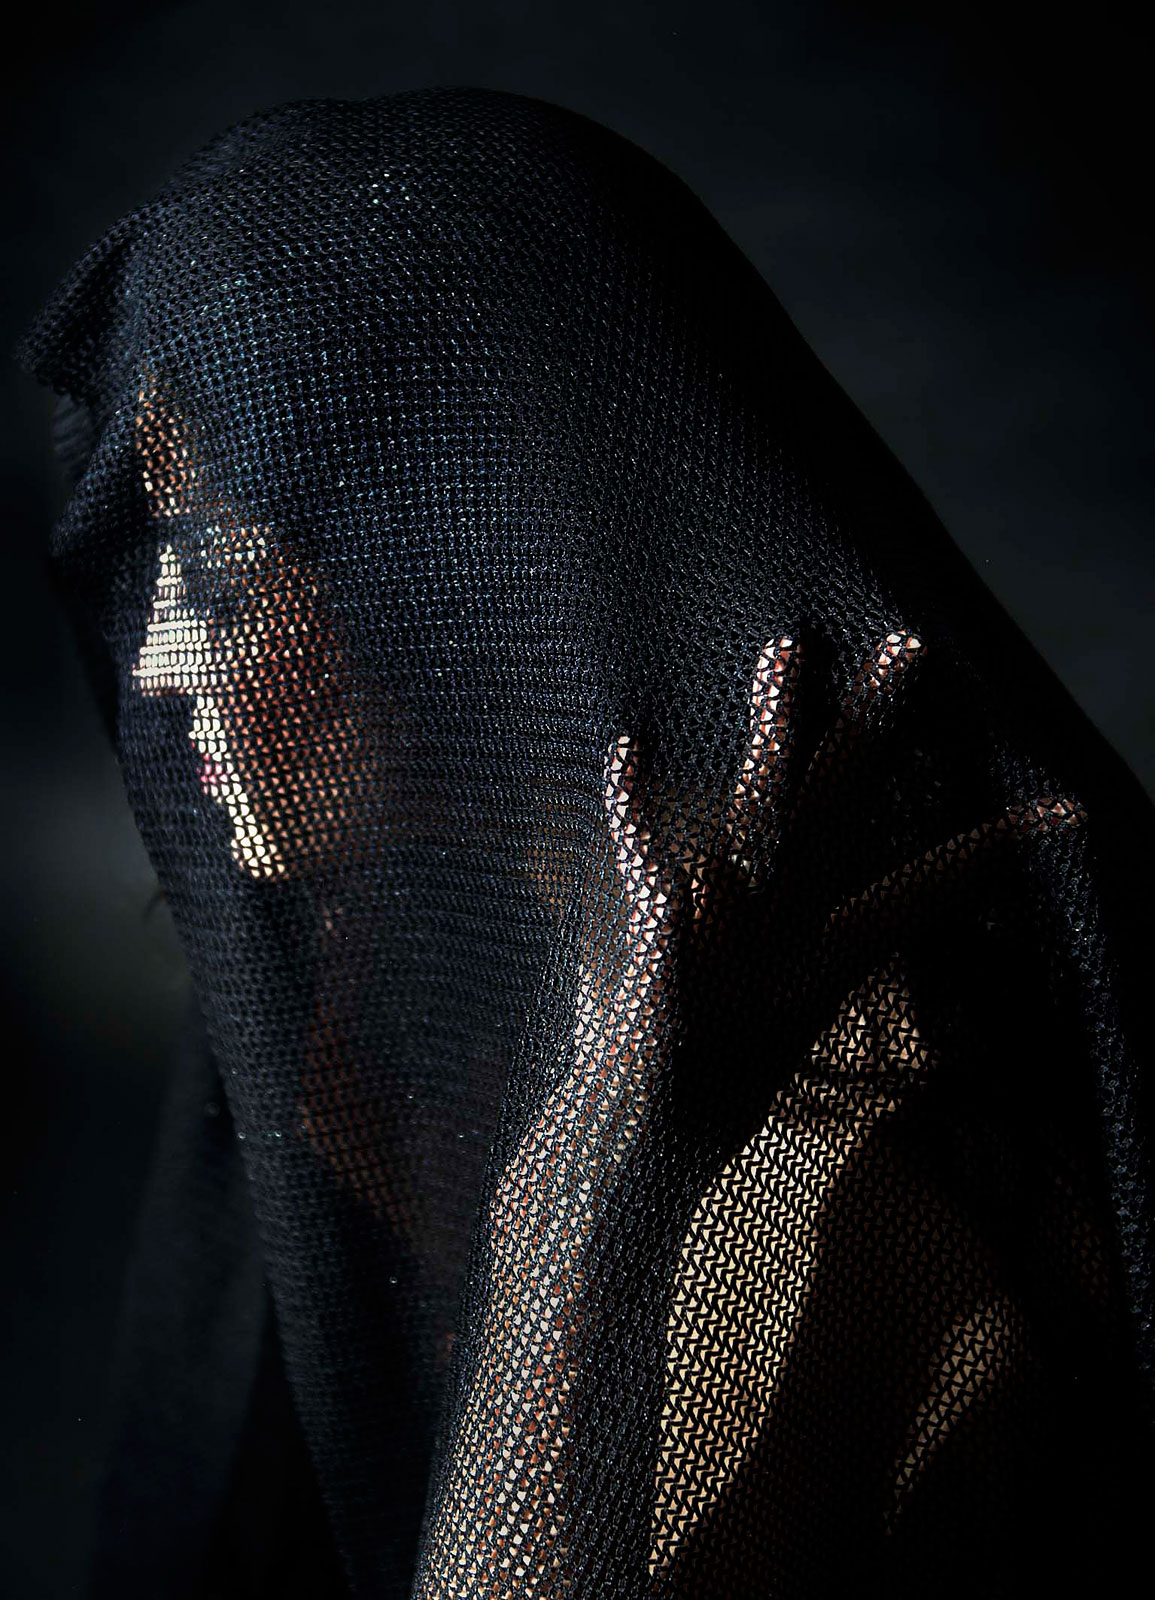 Foto getiteld Second Skin